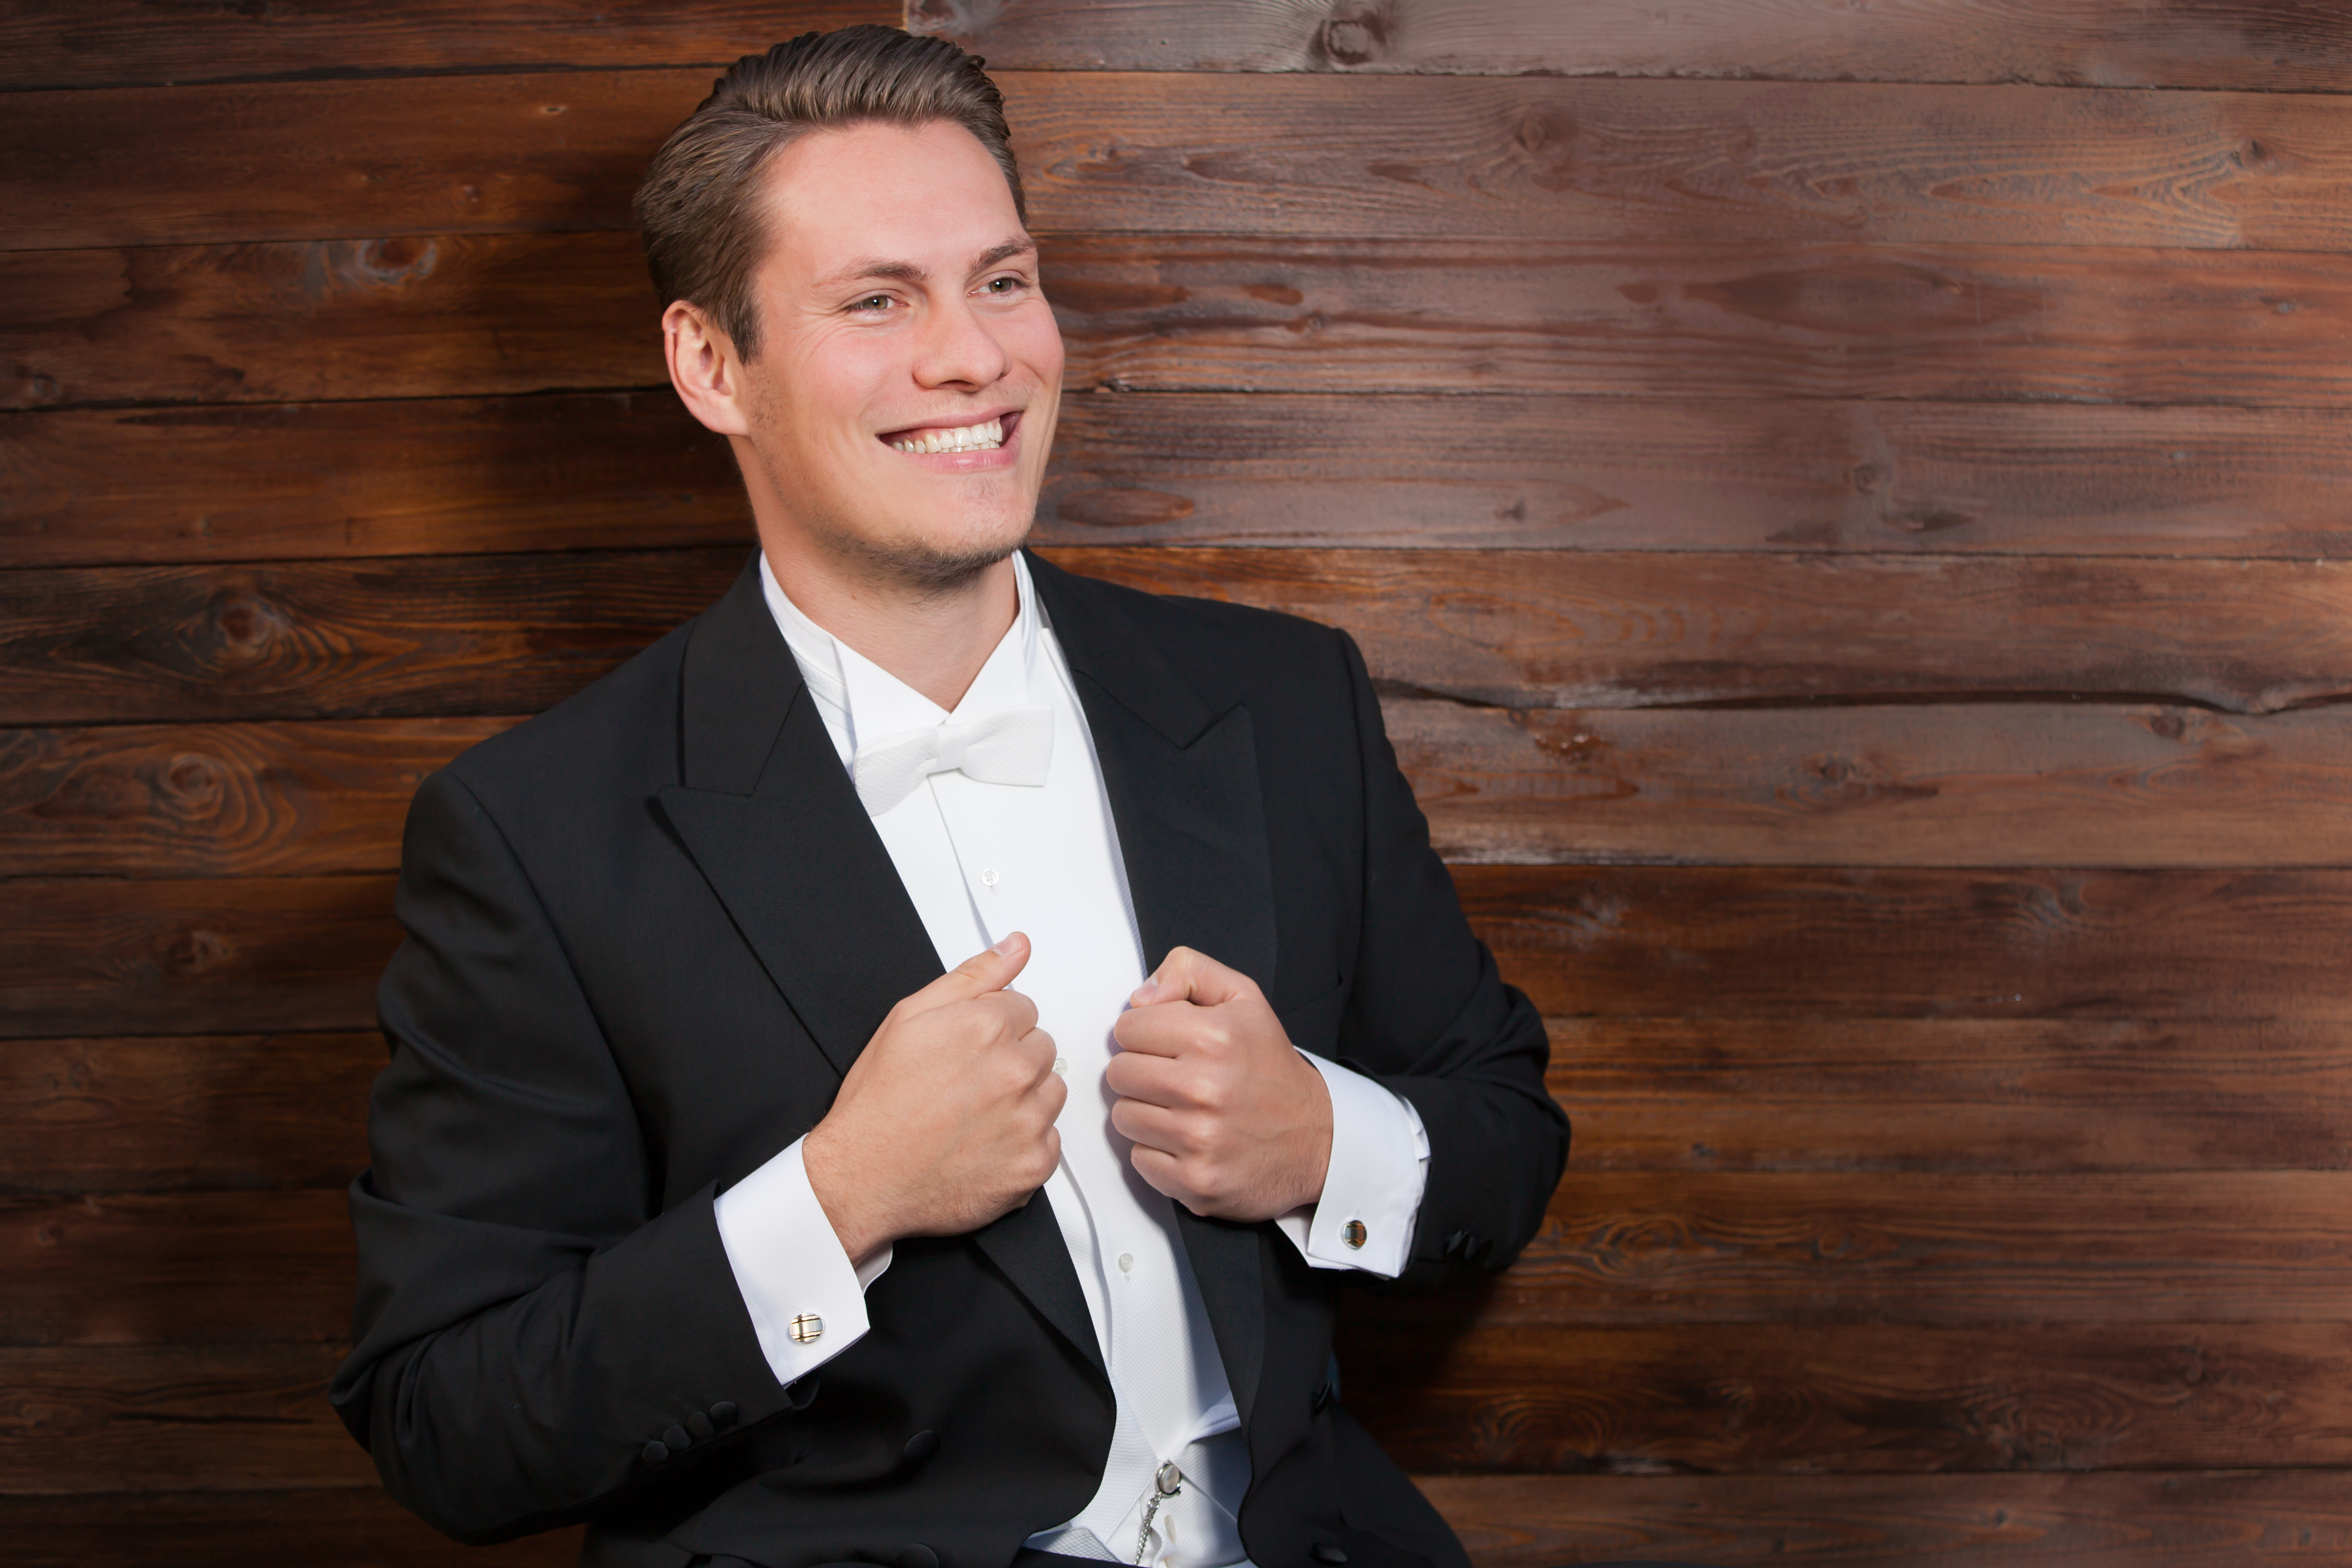 Bastian-Kohl-Opernsänger-1